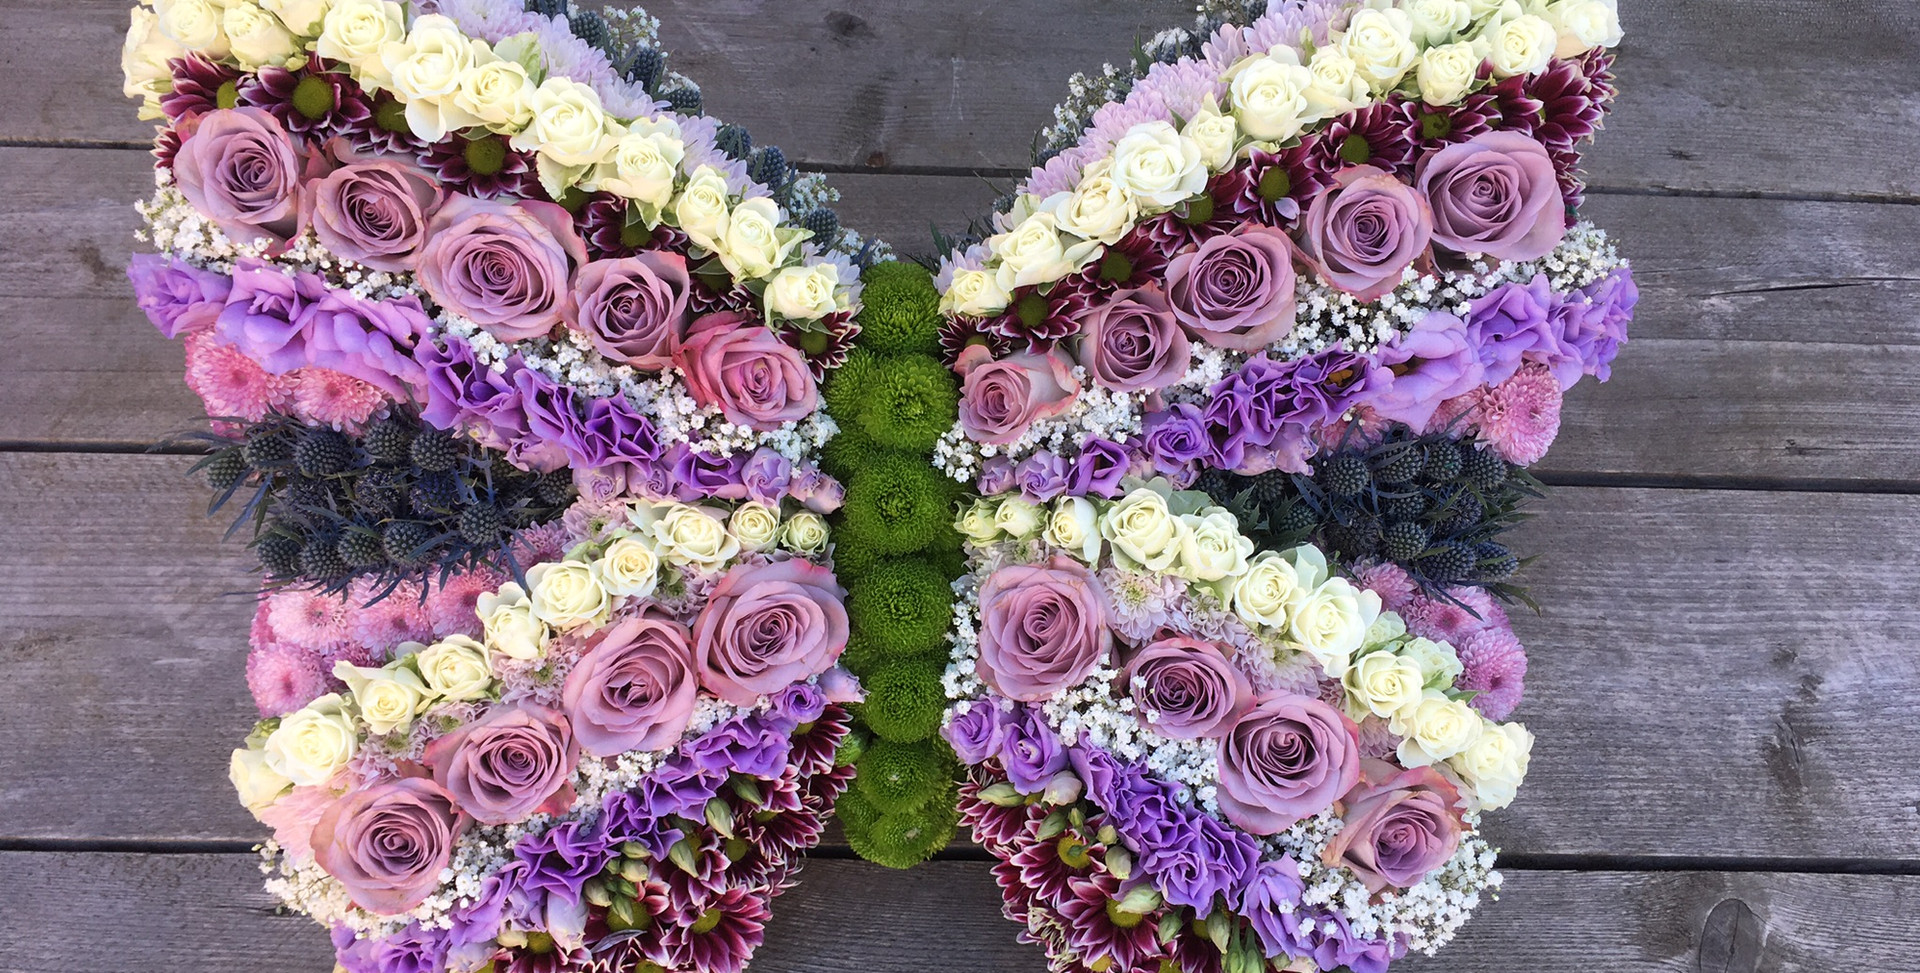 Bespoke Floral Tribute - Butterfly